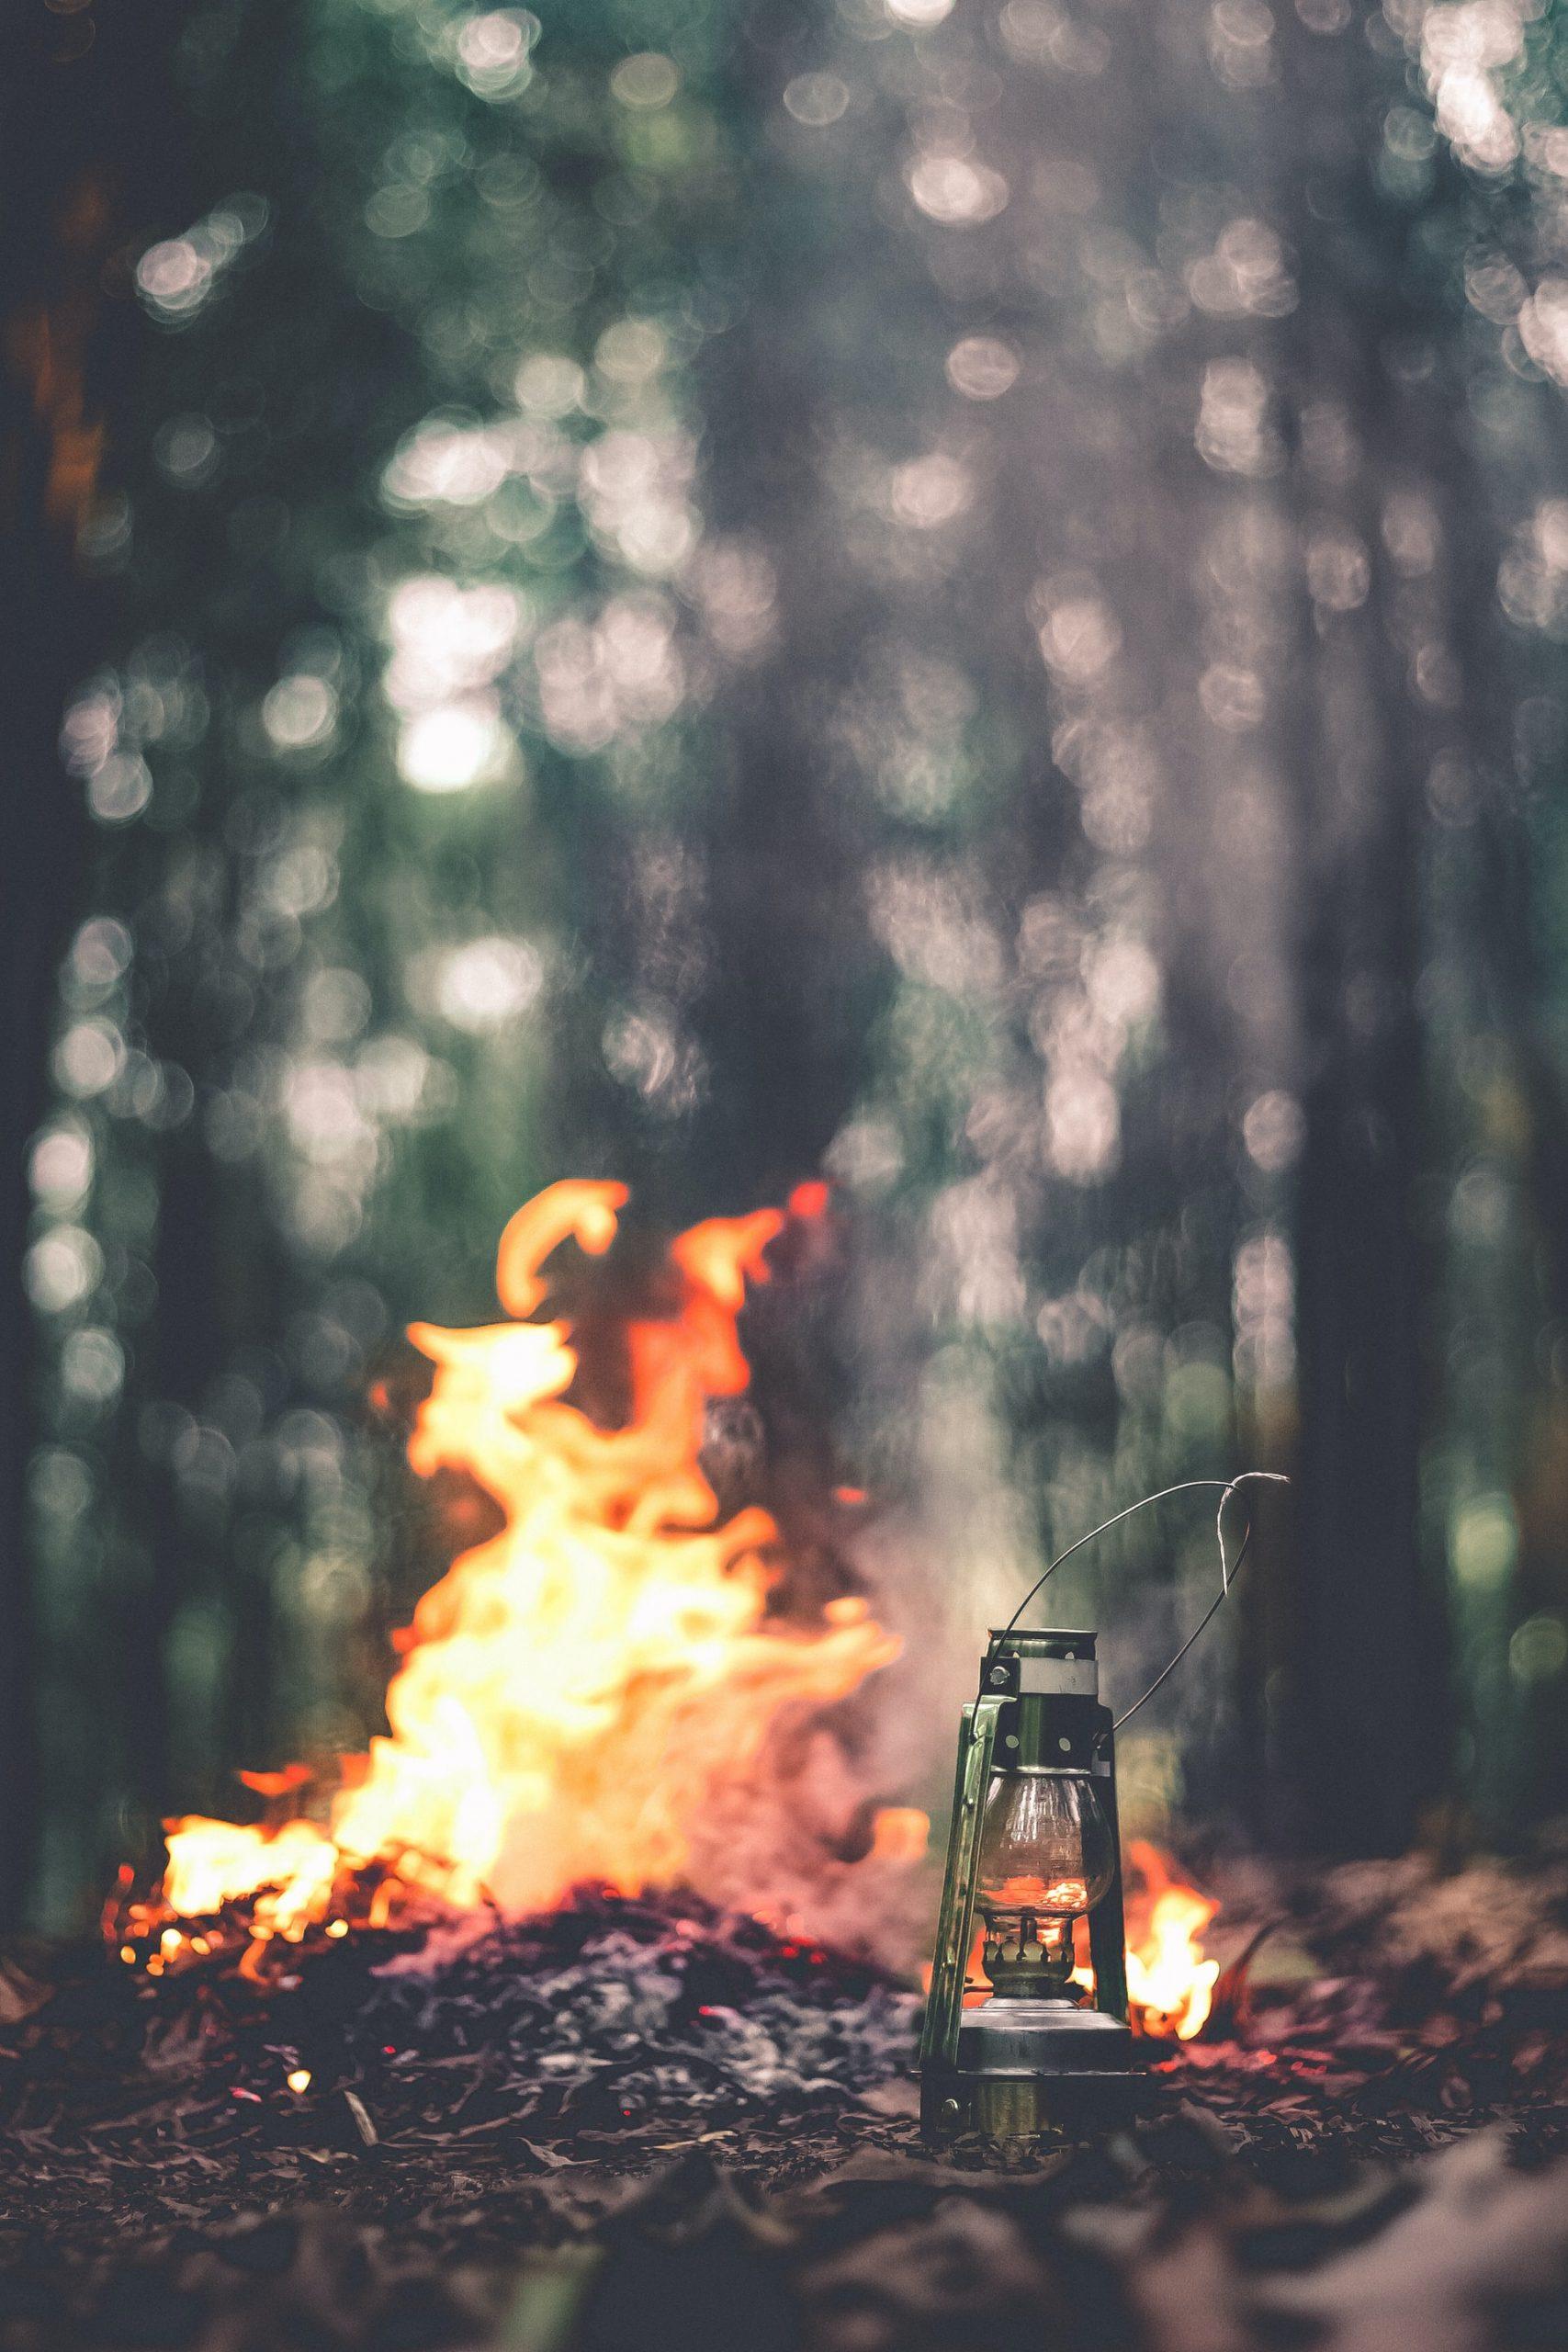 campfire-lamp